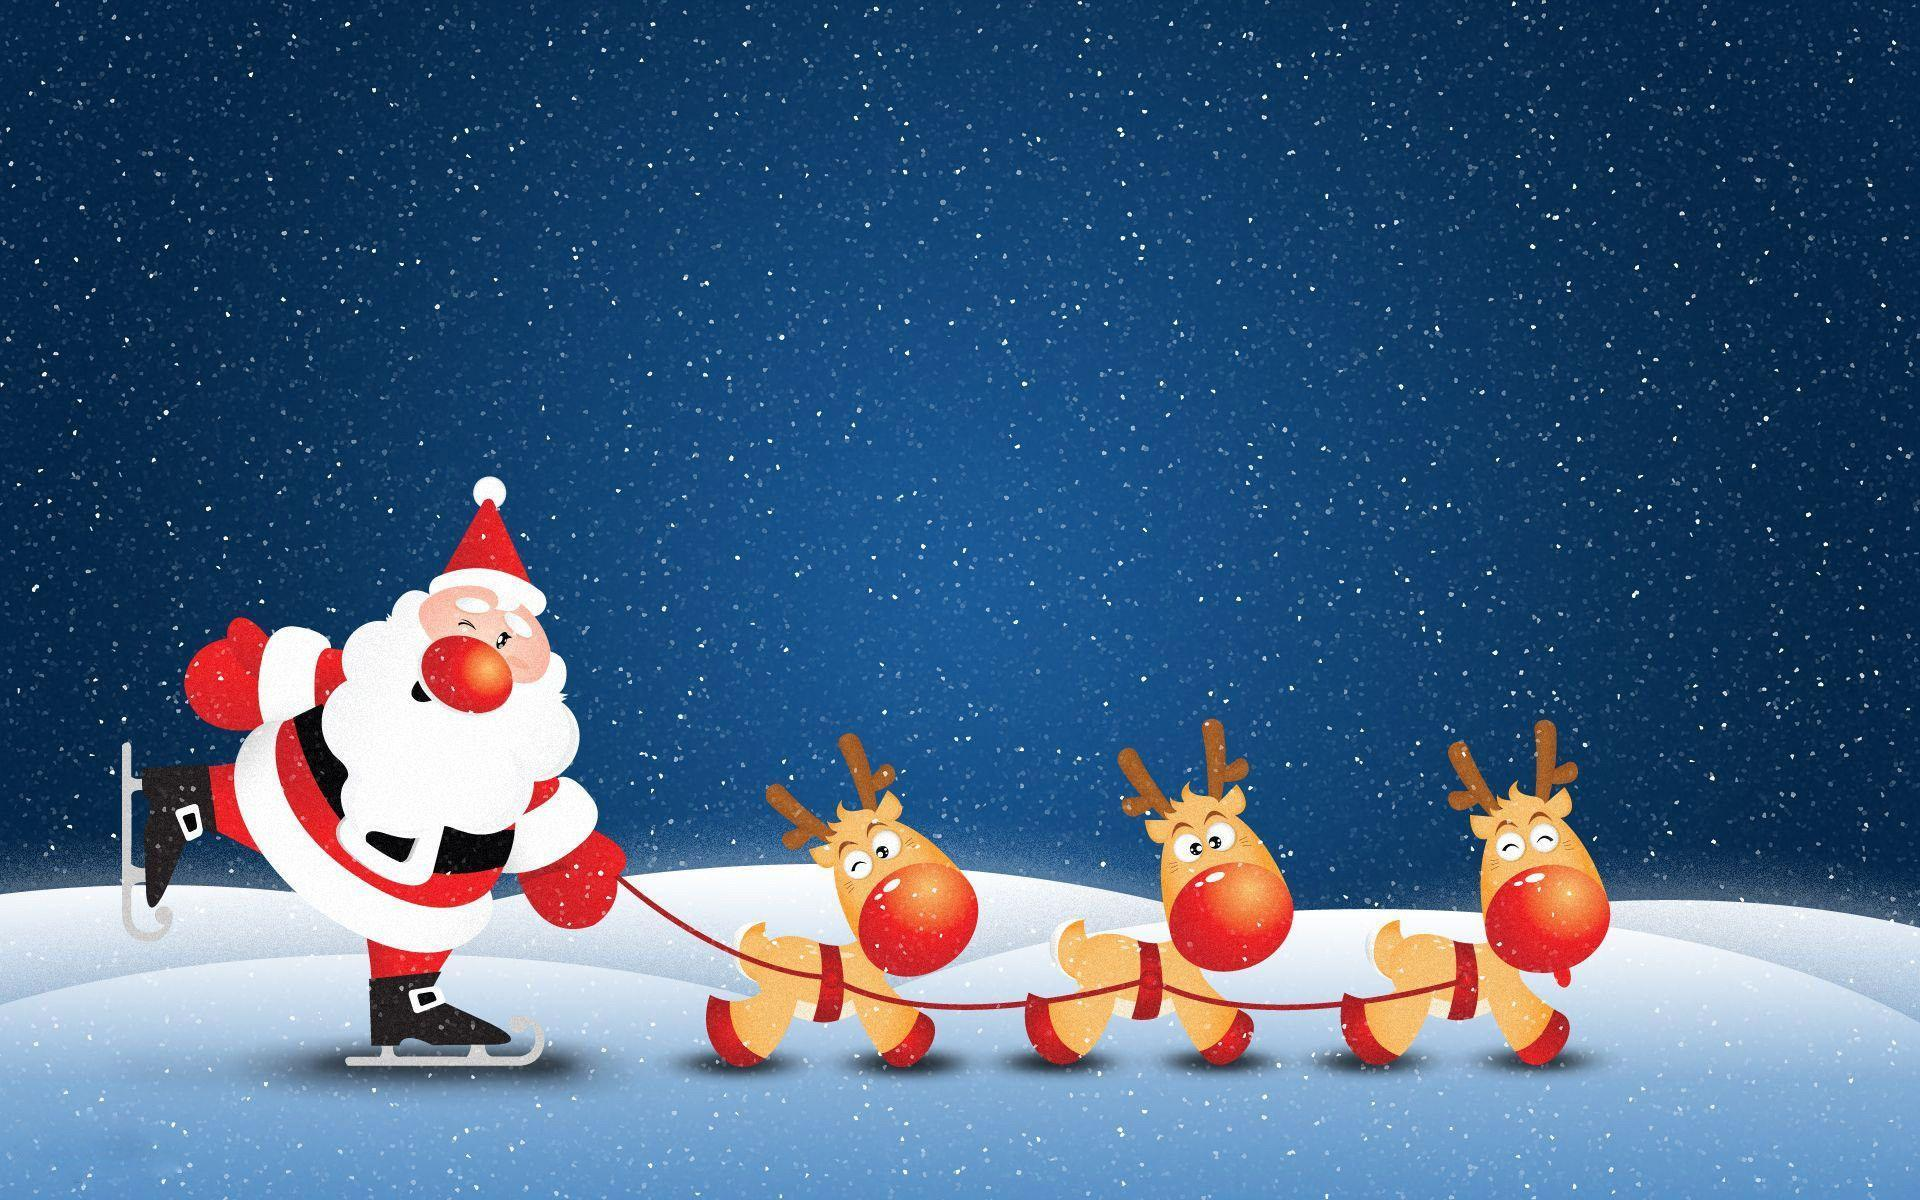 Santa Claus Wallpapers - Wallpaper Cave